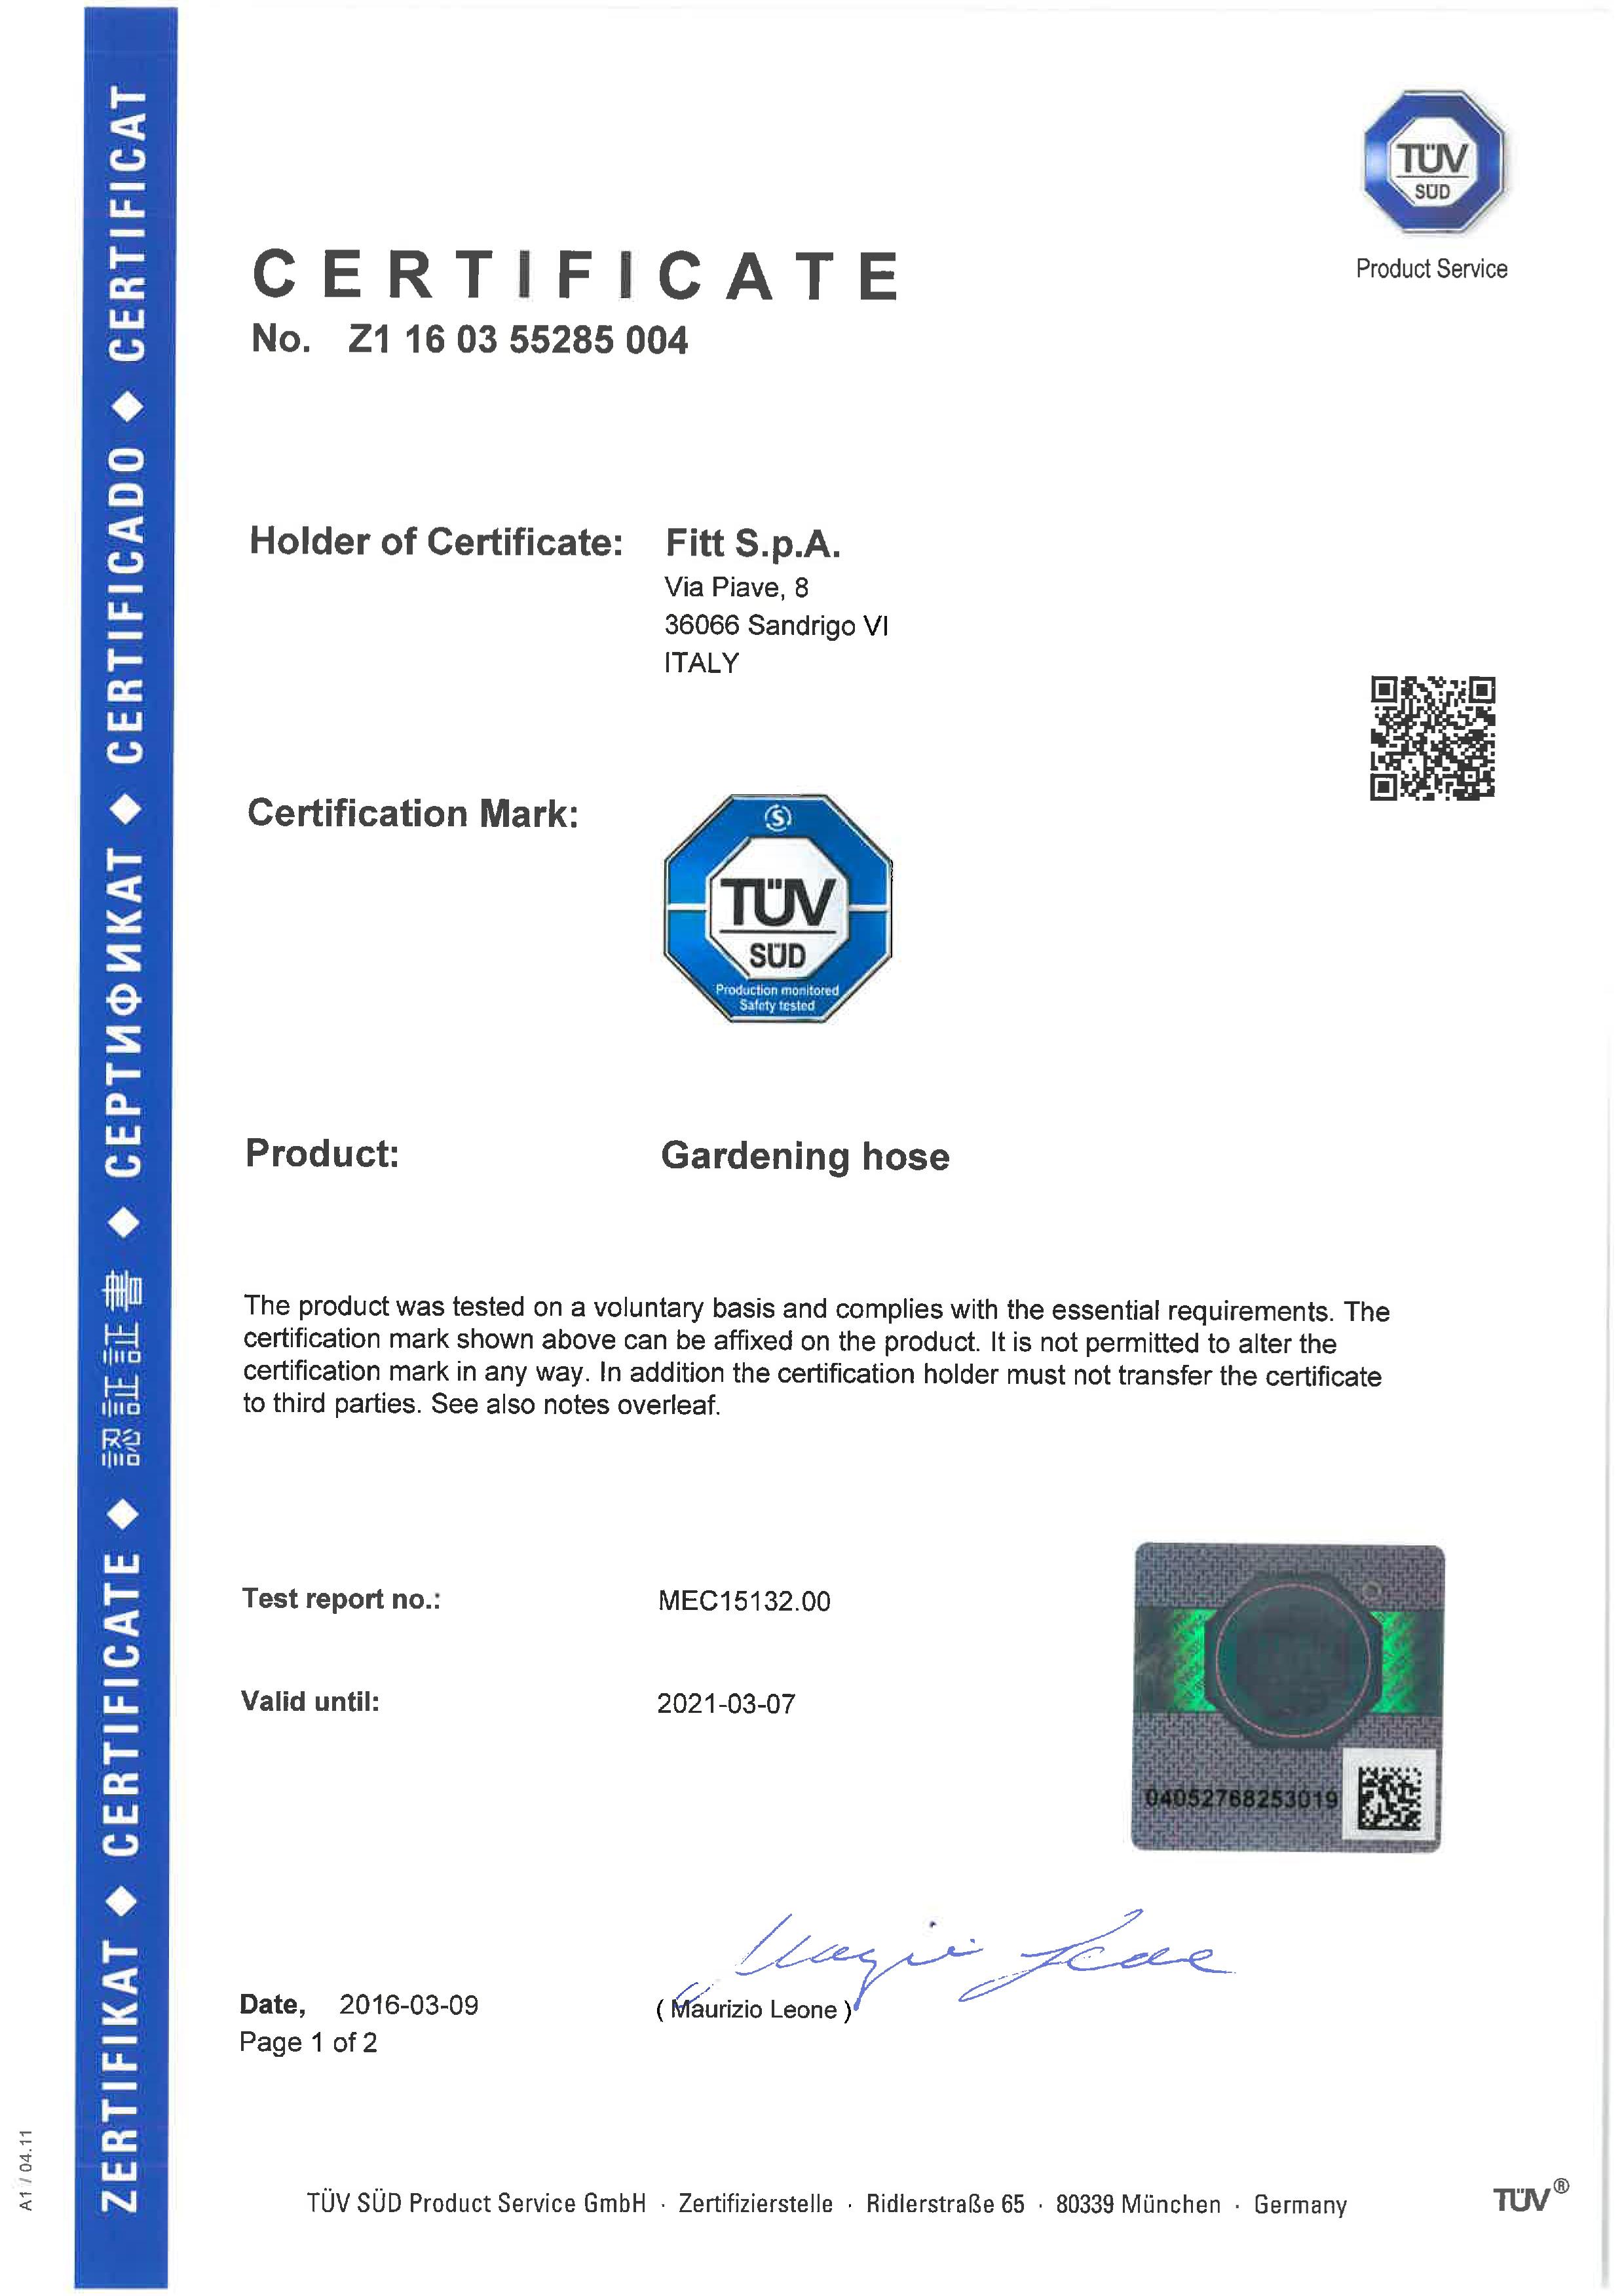 Сертификат_YOYO_TUV_SUD-1.jpg